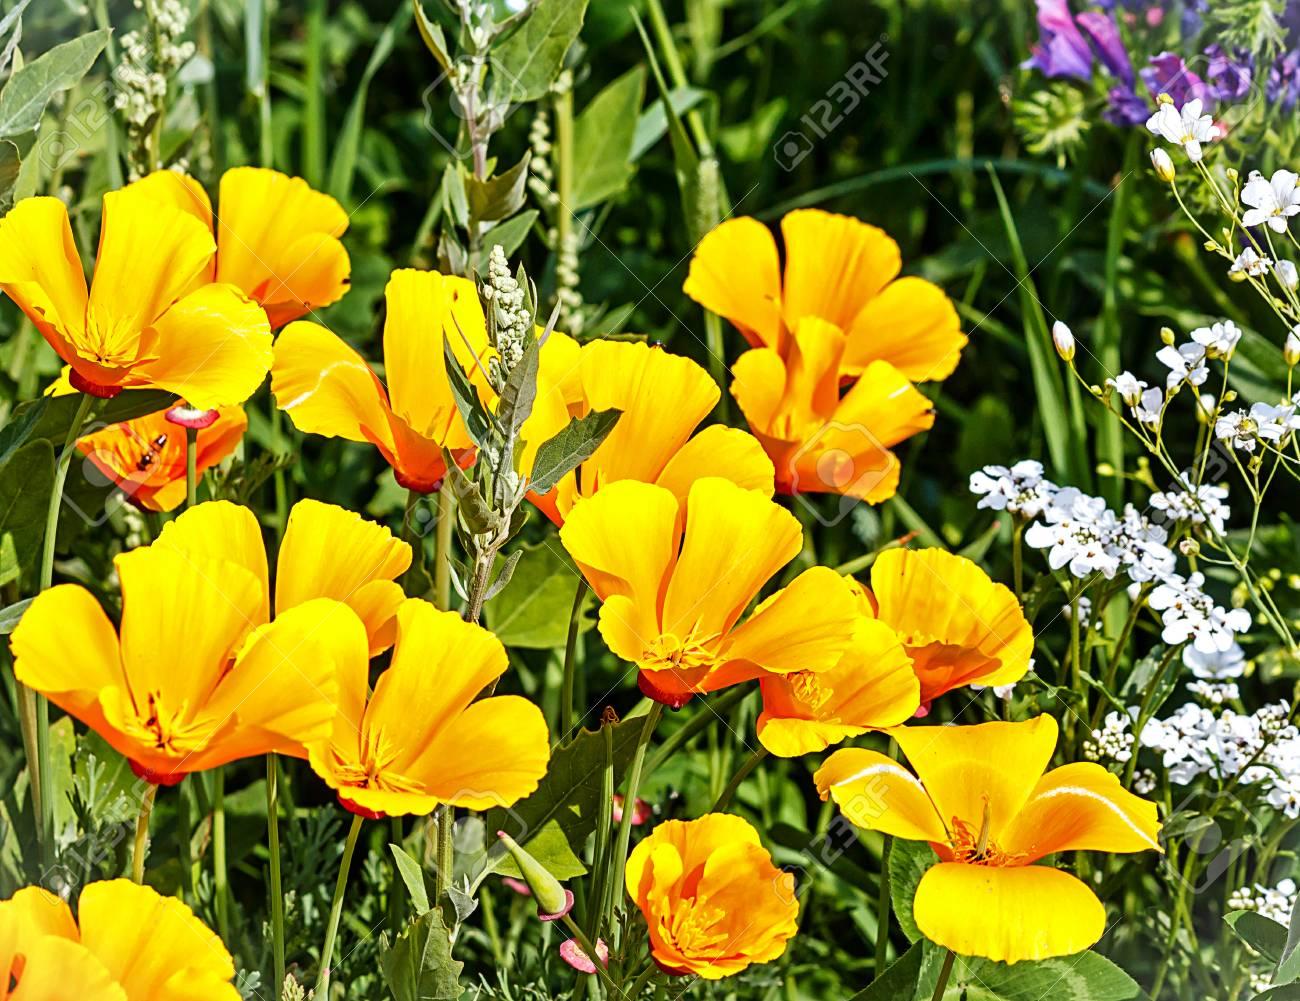 Bright Shiny Yellow Poppy Flowers Of Eschscholzia Glyptosperma